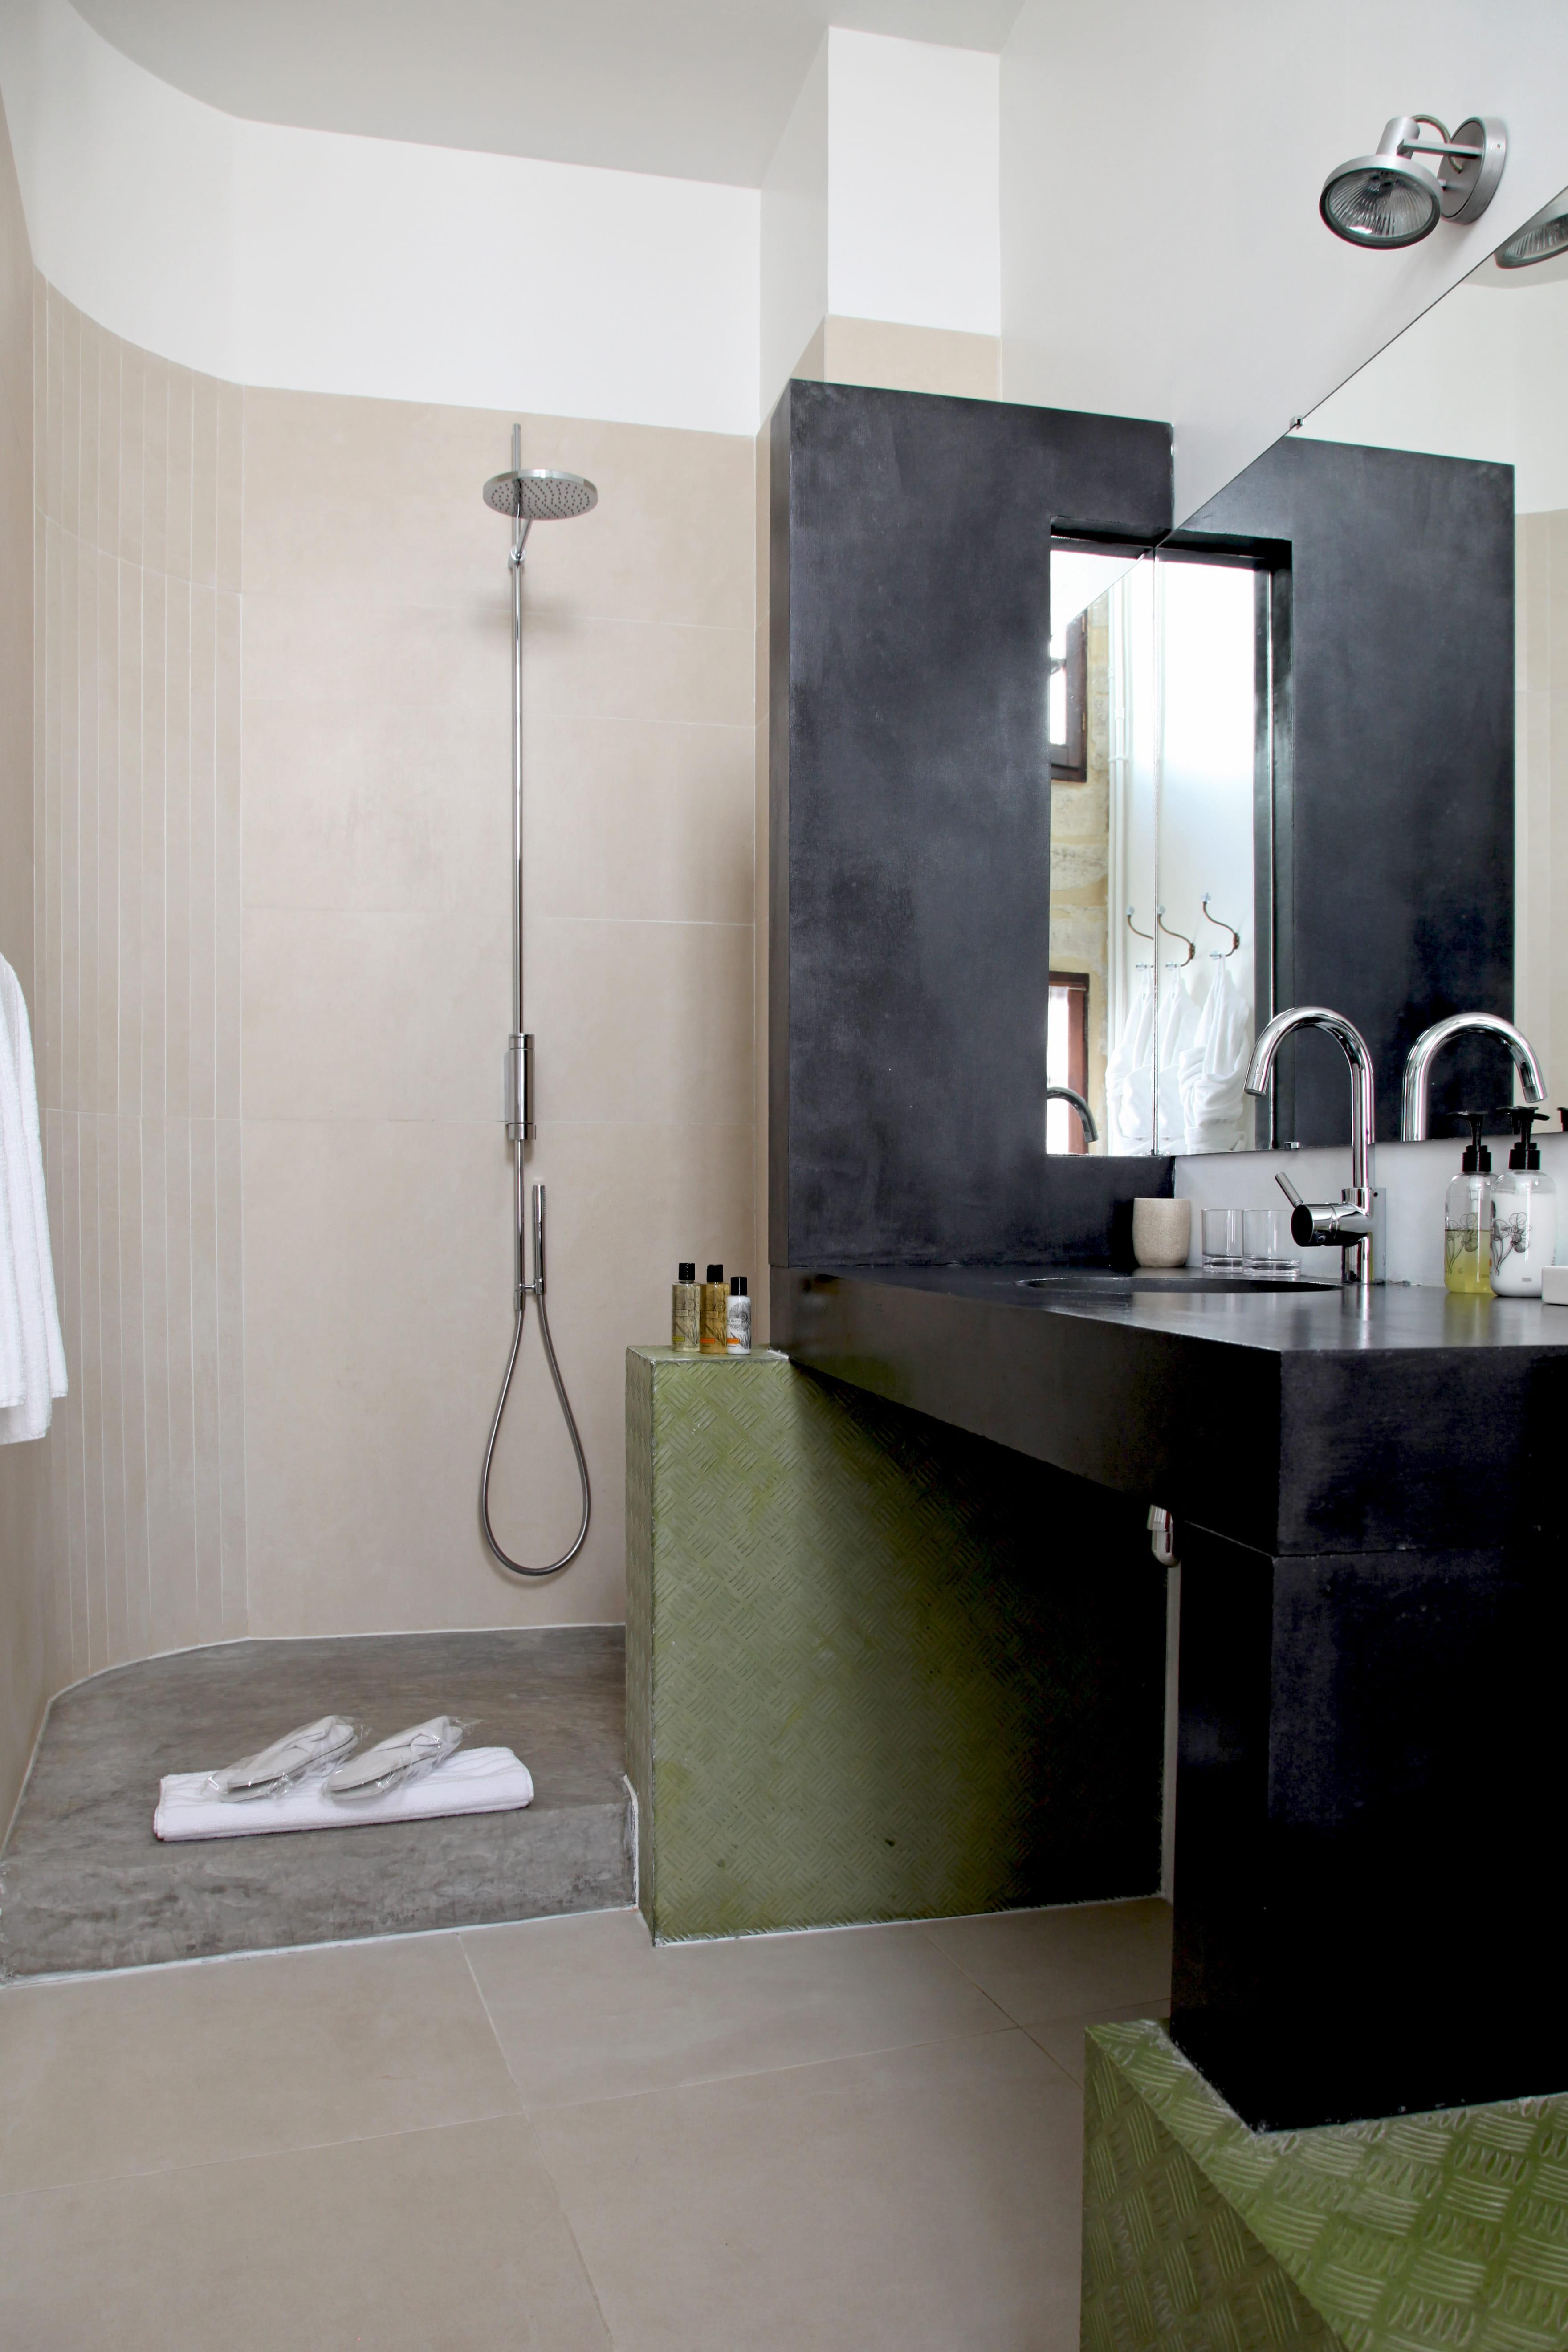 Idee salle de bain italienne avec des id es int ressantes pour - Idee salle de bain italienne ...